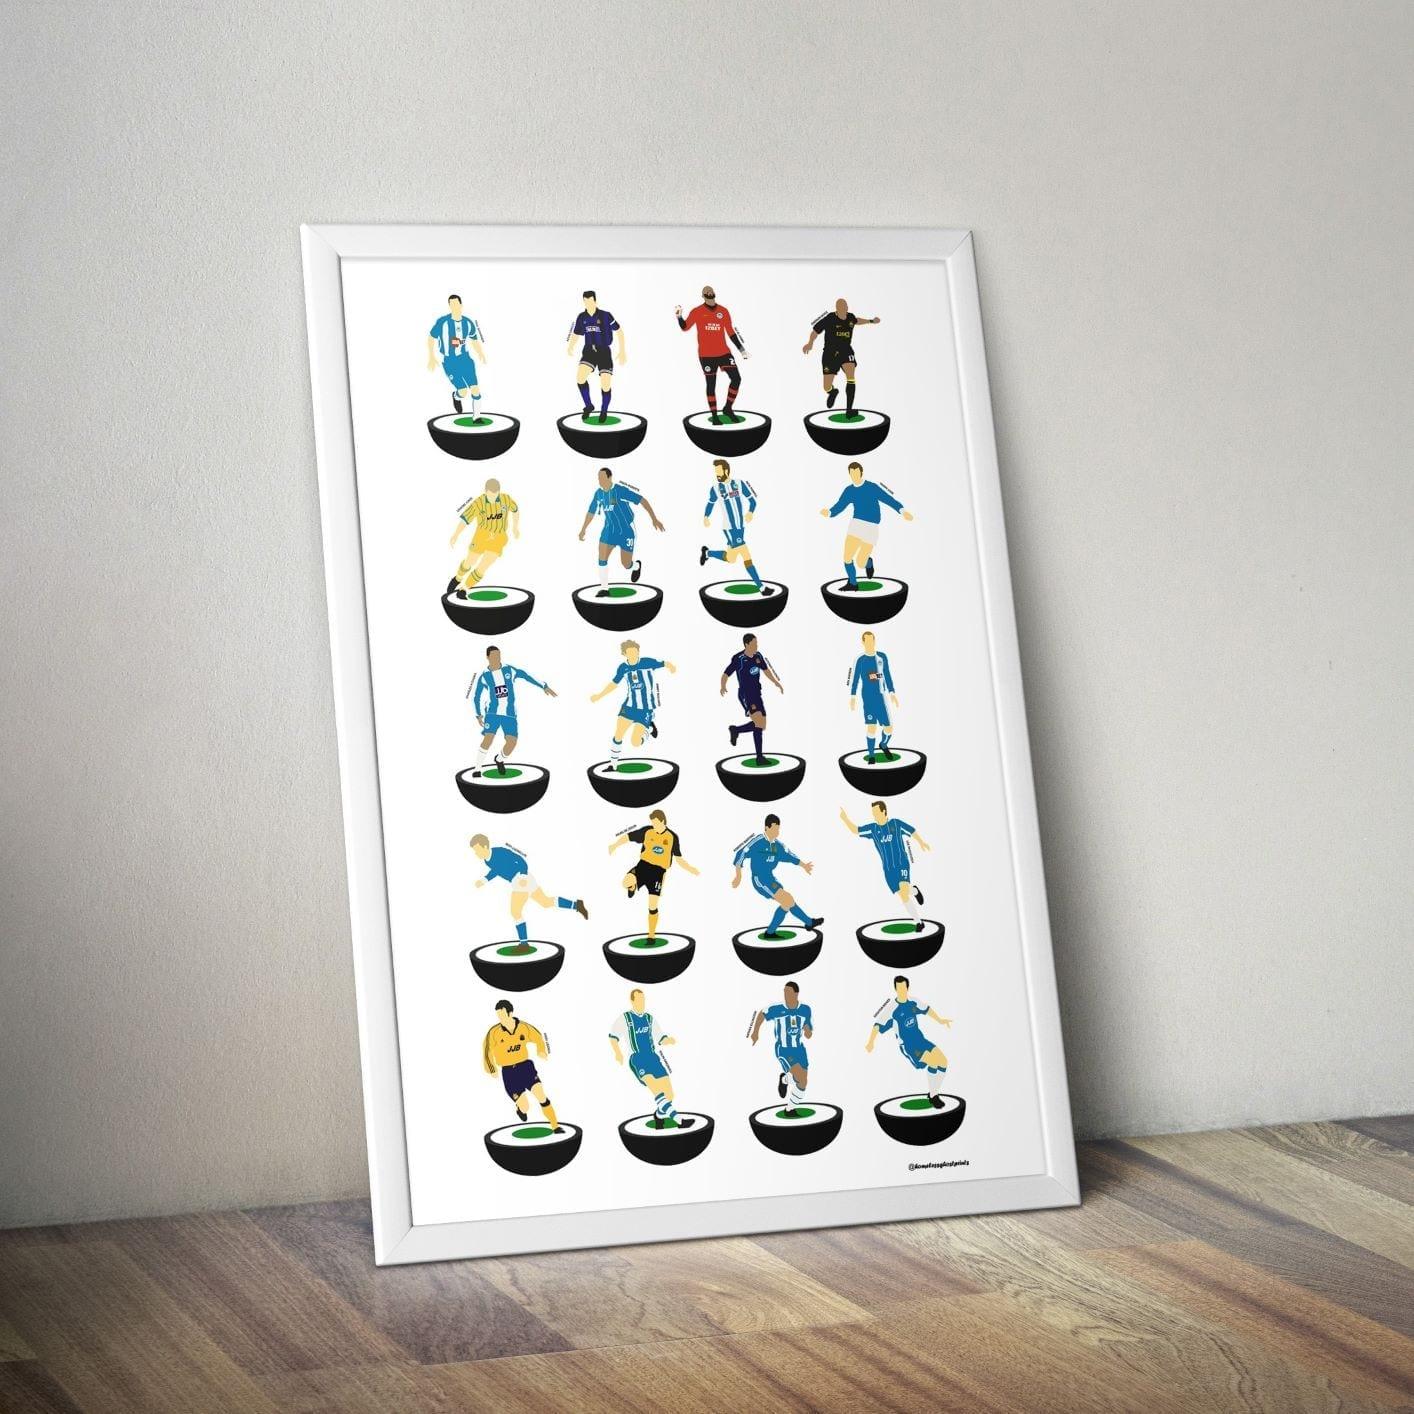 Wigan Athletic Subbuteo Print – Unframed